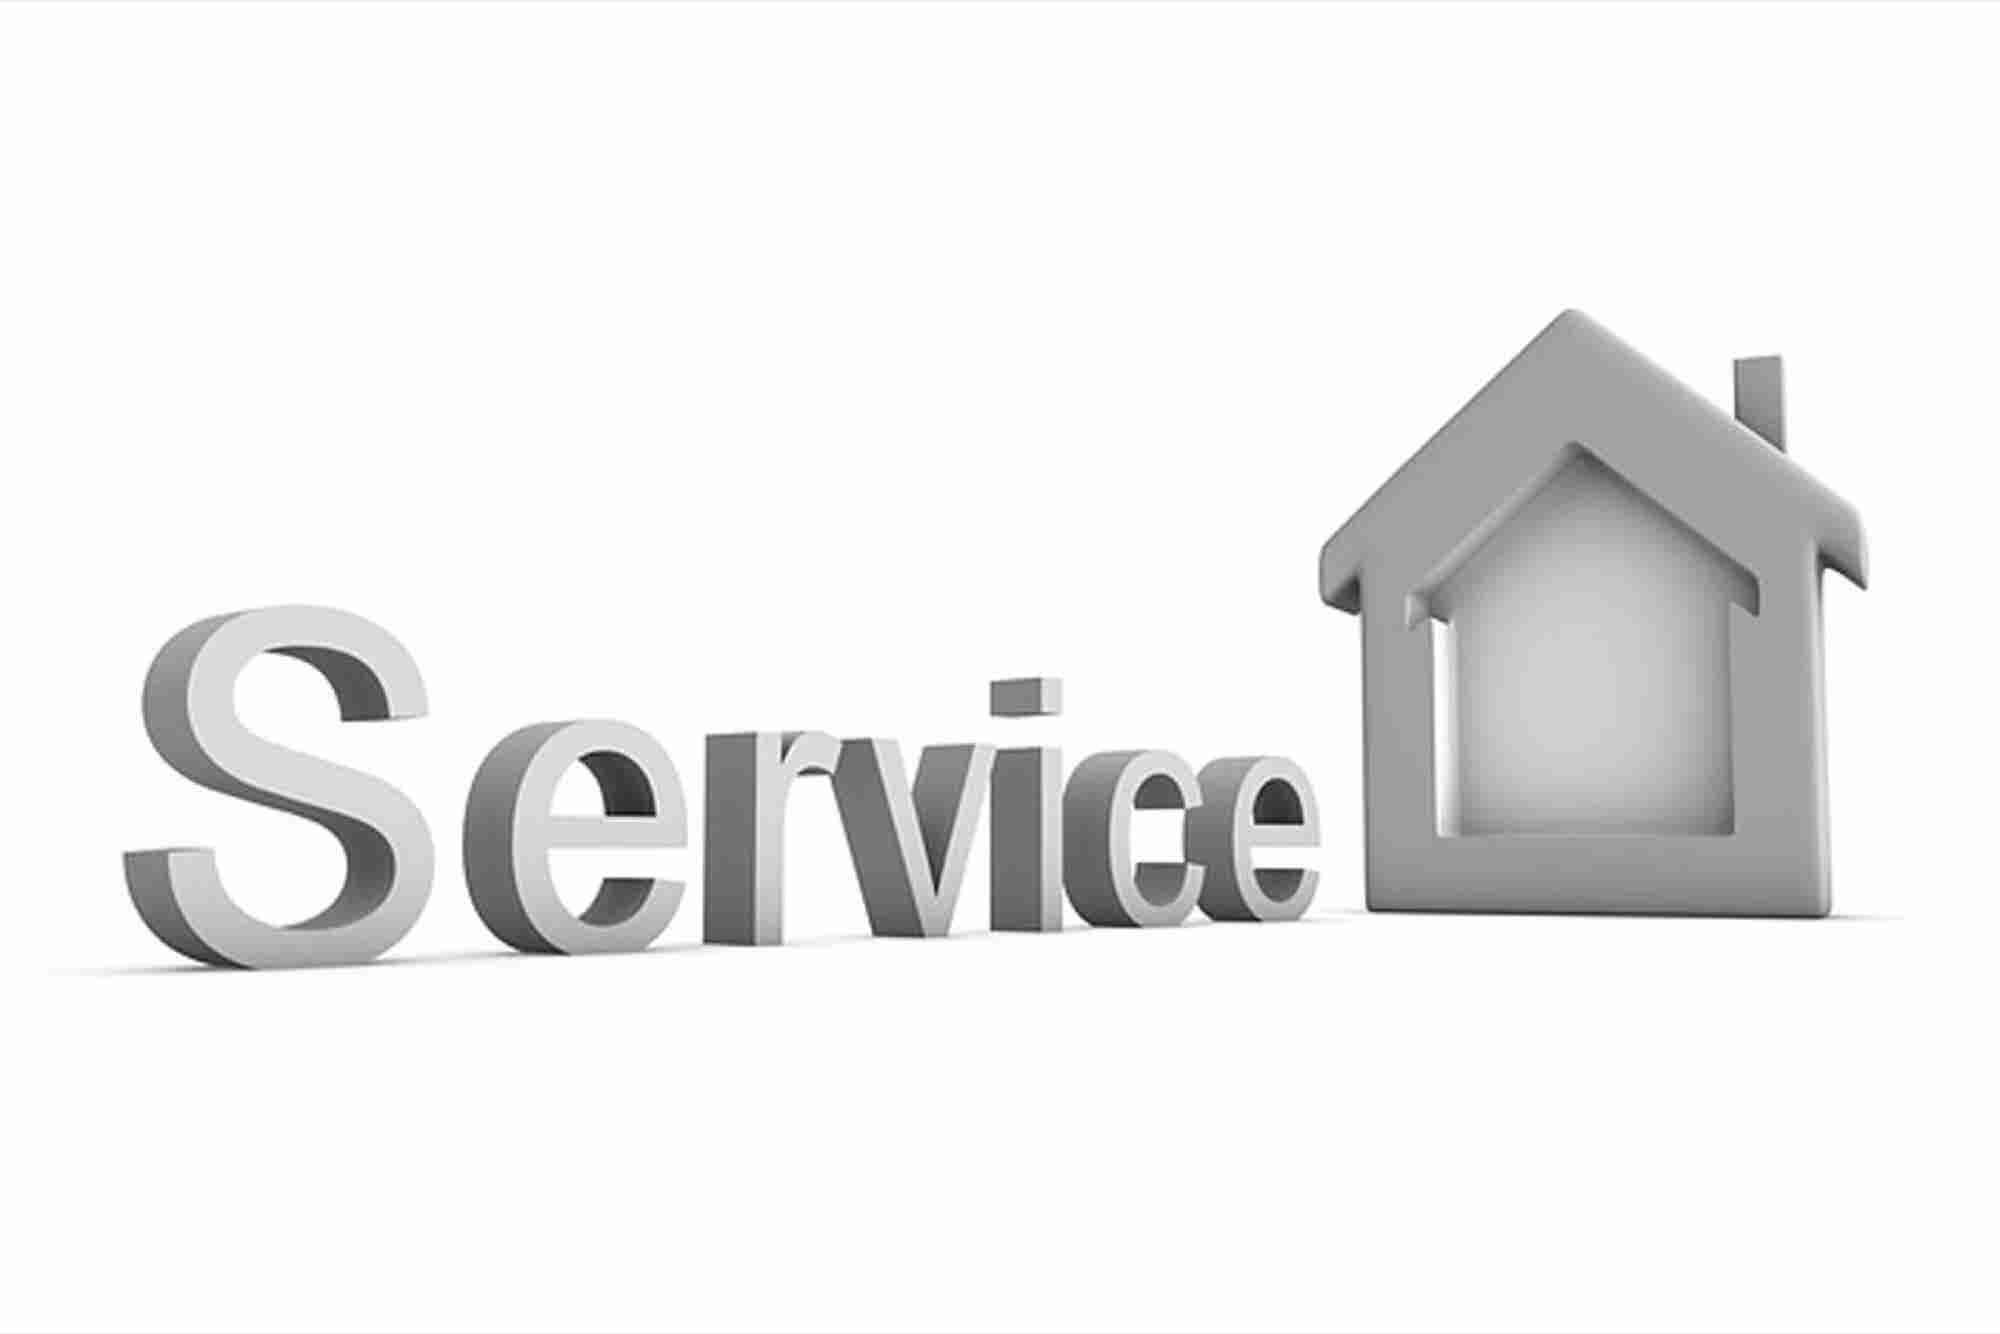 The rise of 'service' aggregators